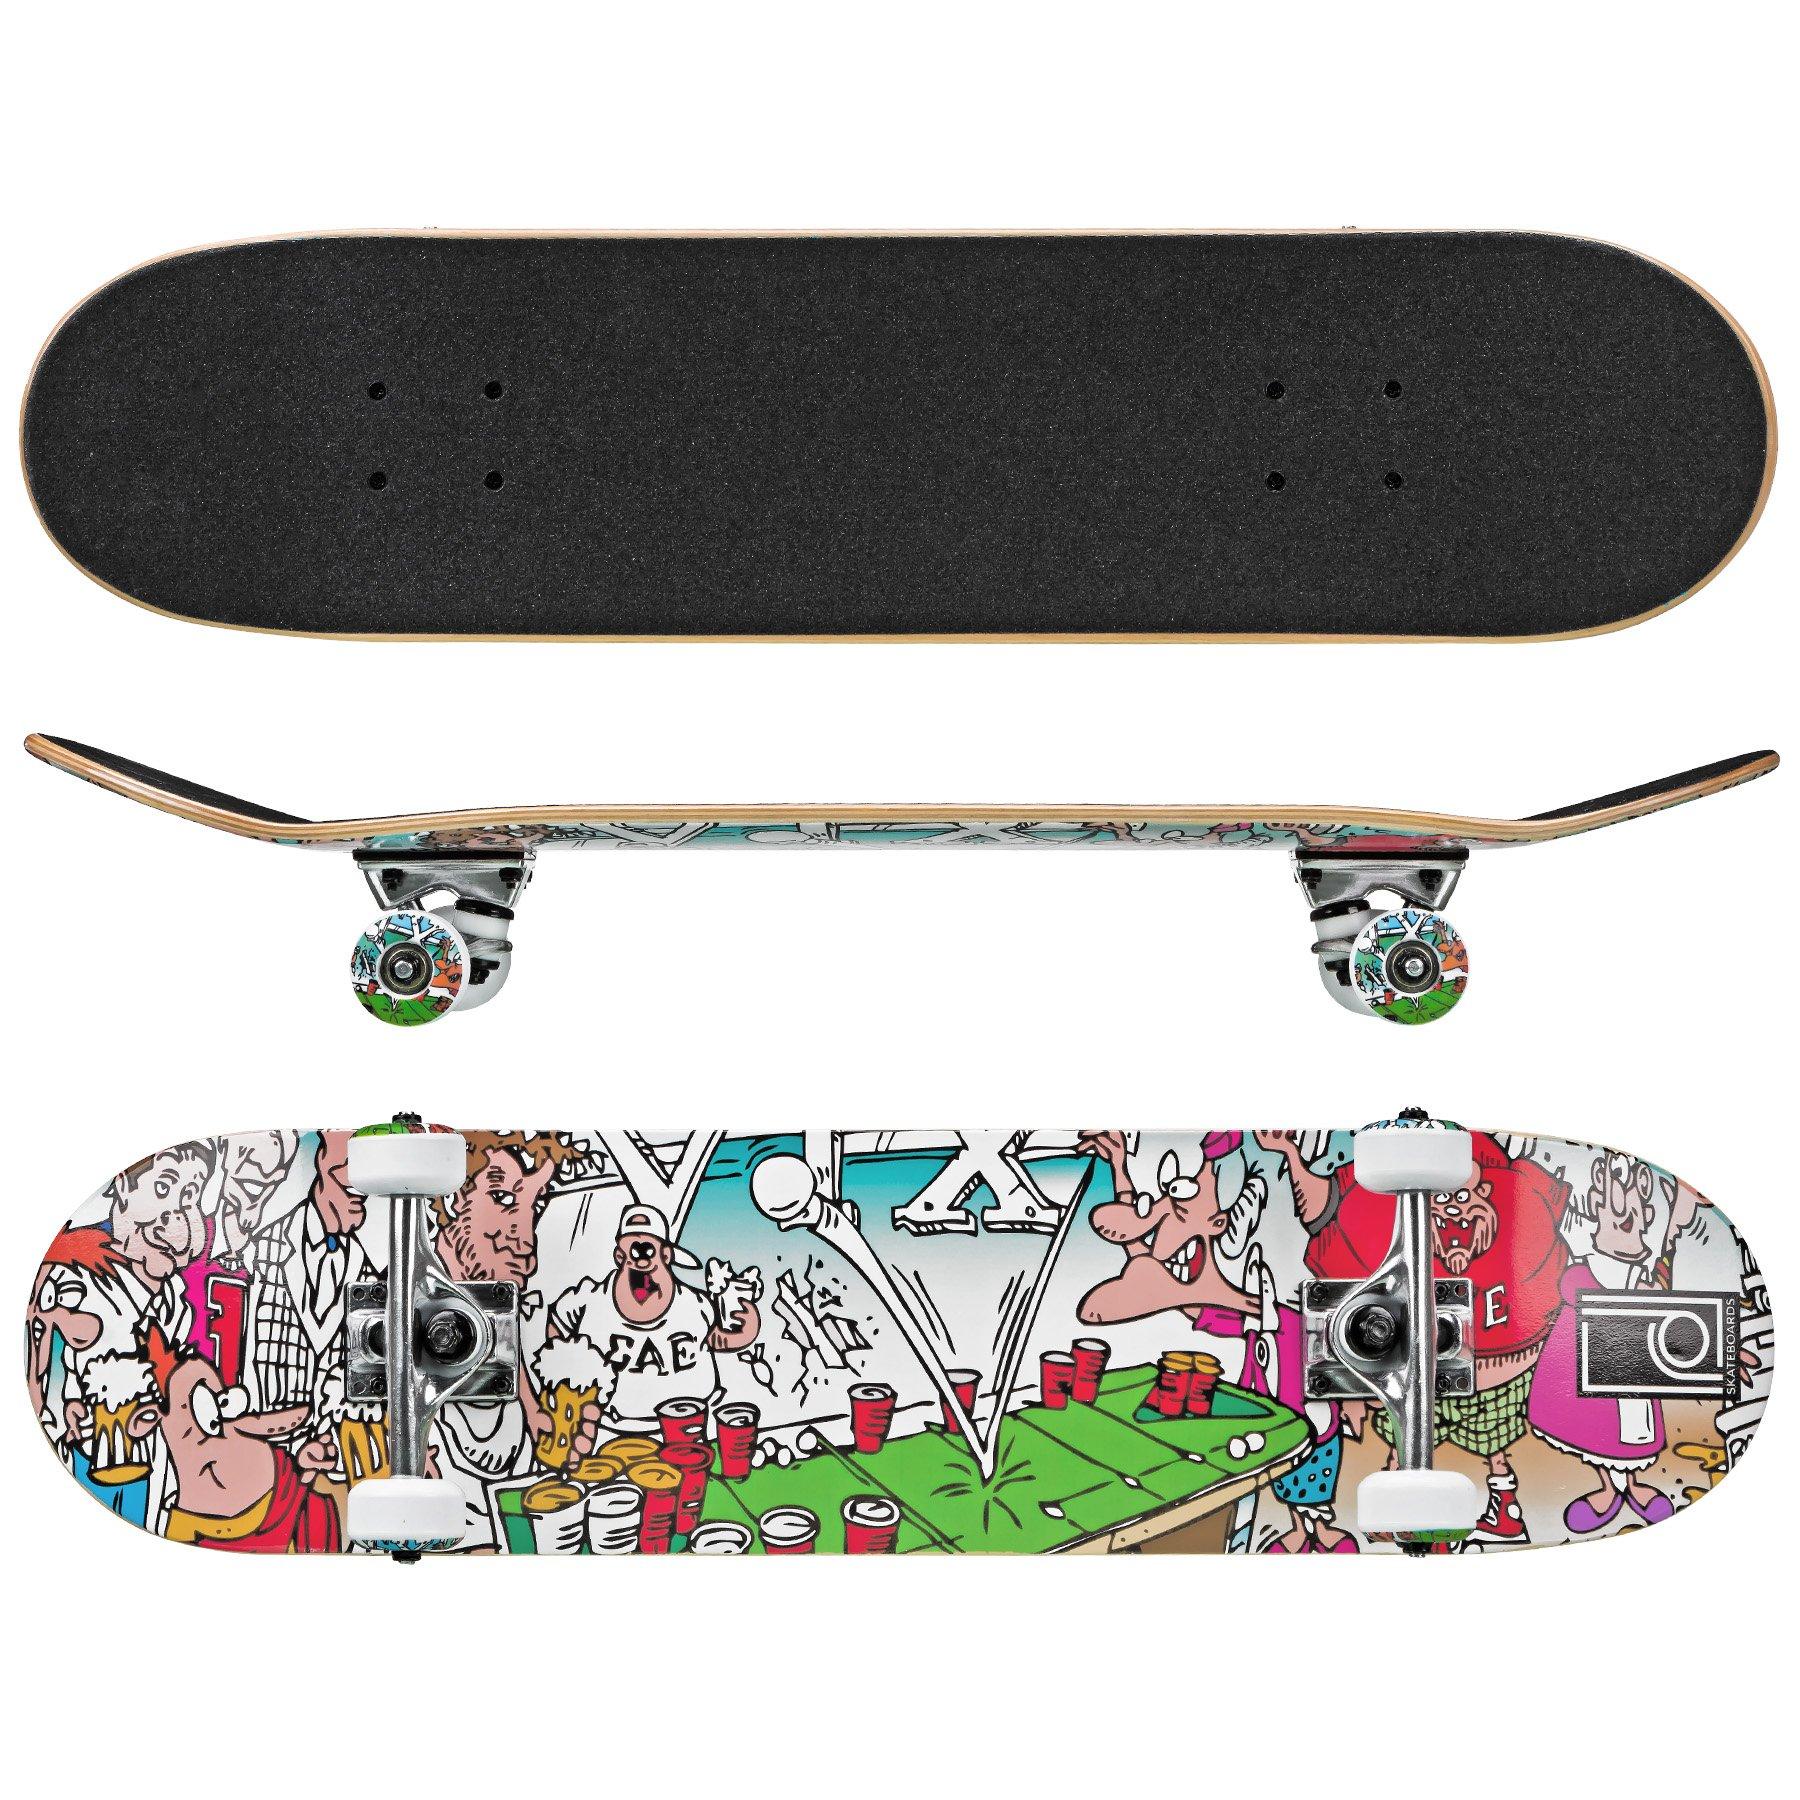 Roller Derby Rd Street Series Skateboard Frat House, Multi, 31' x 8'